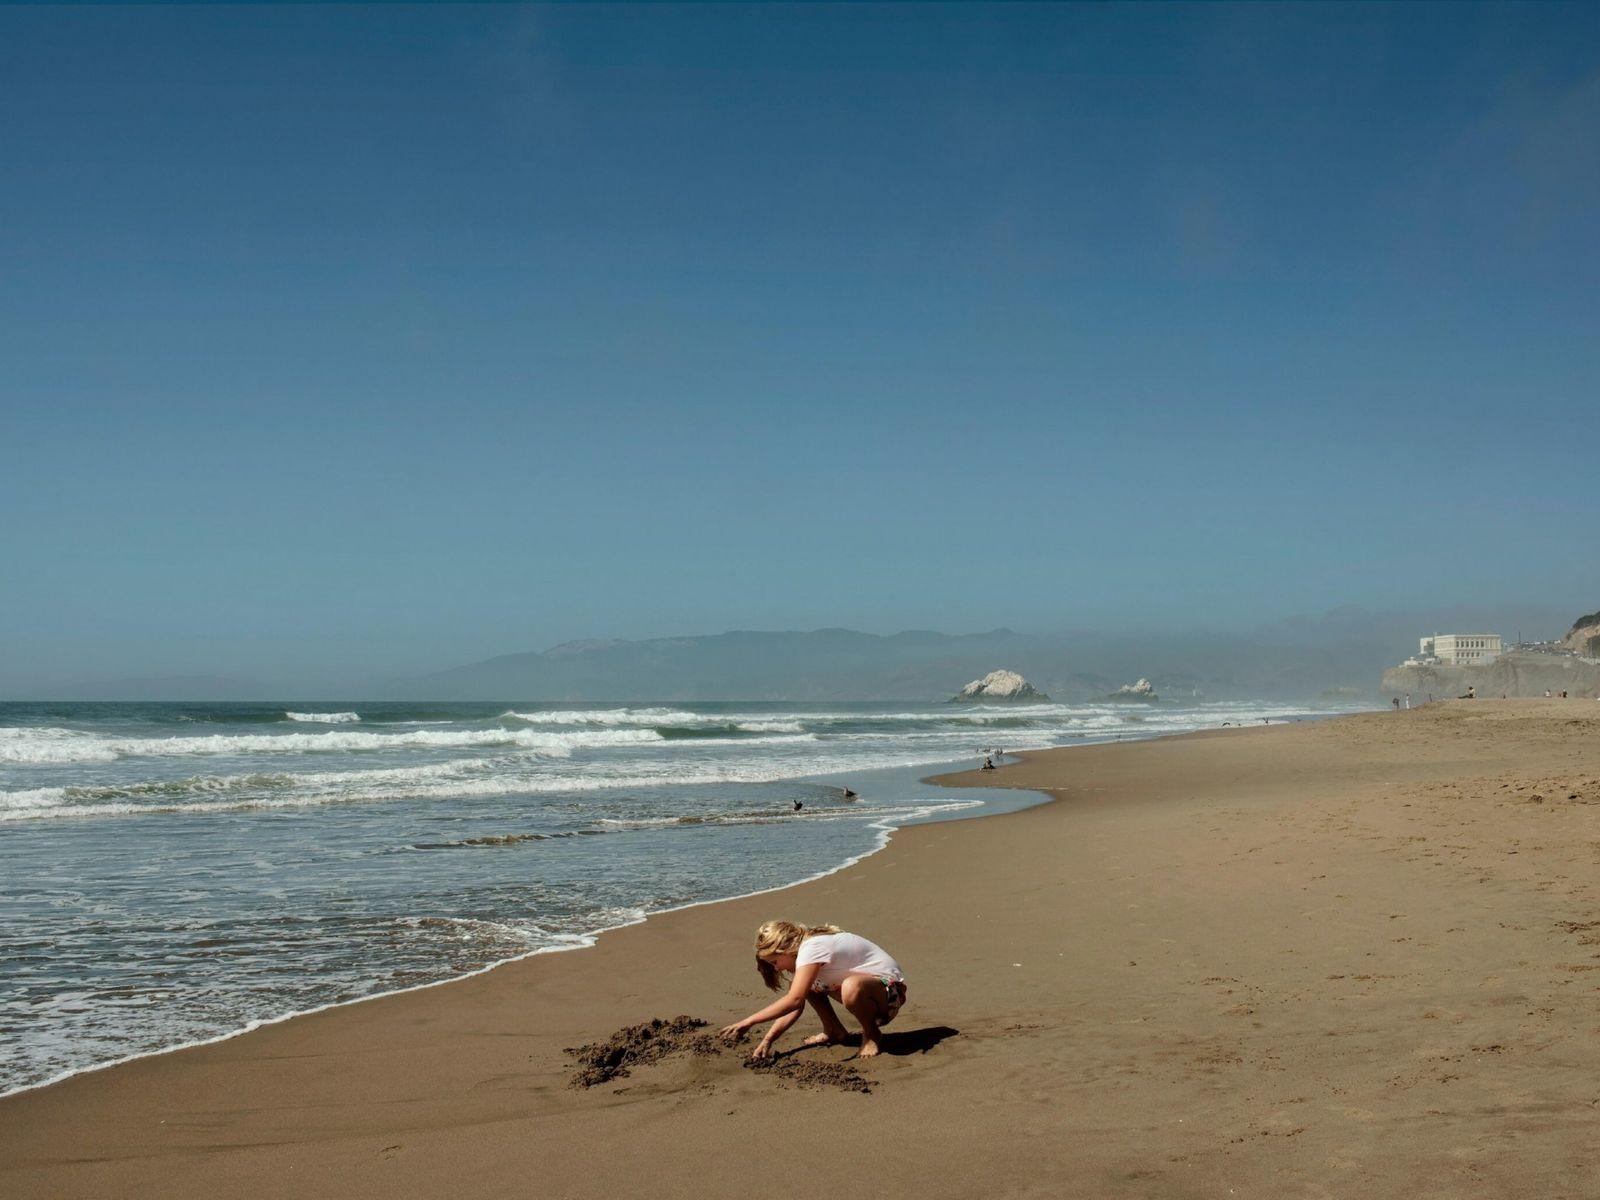 Blonde girl playing with sand on Ocean Beach, San Francisco, California, USA. Sep 2019